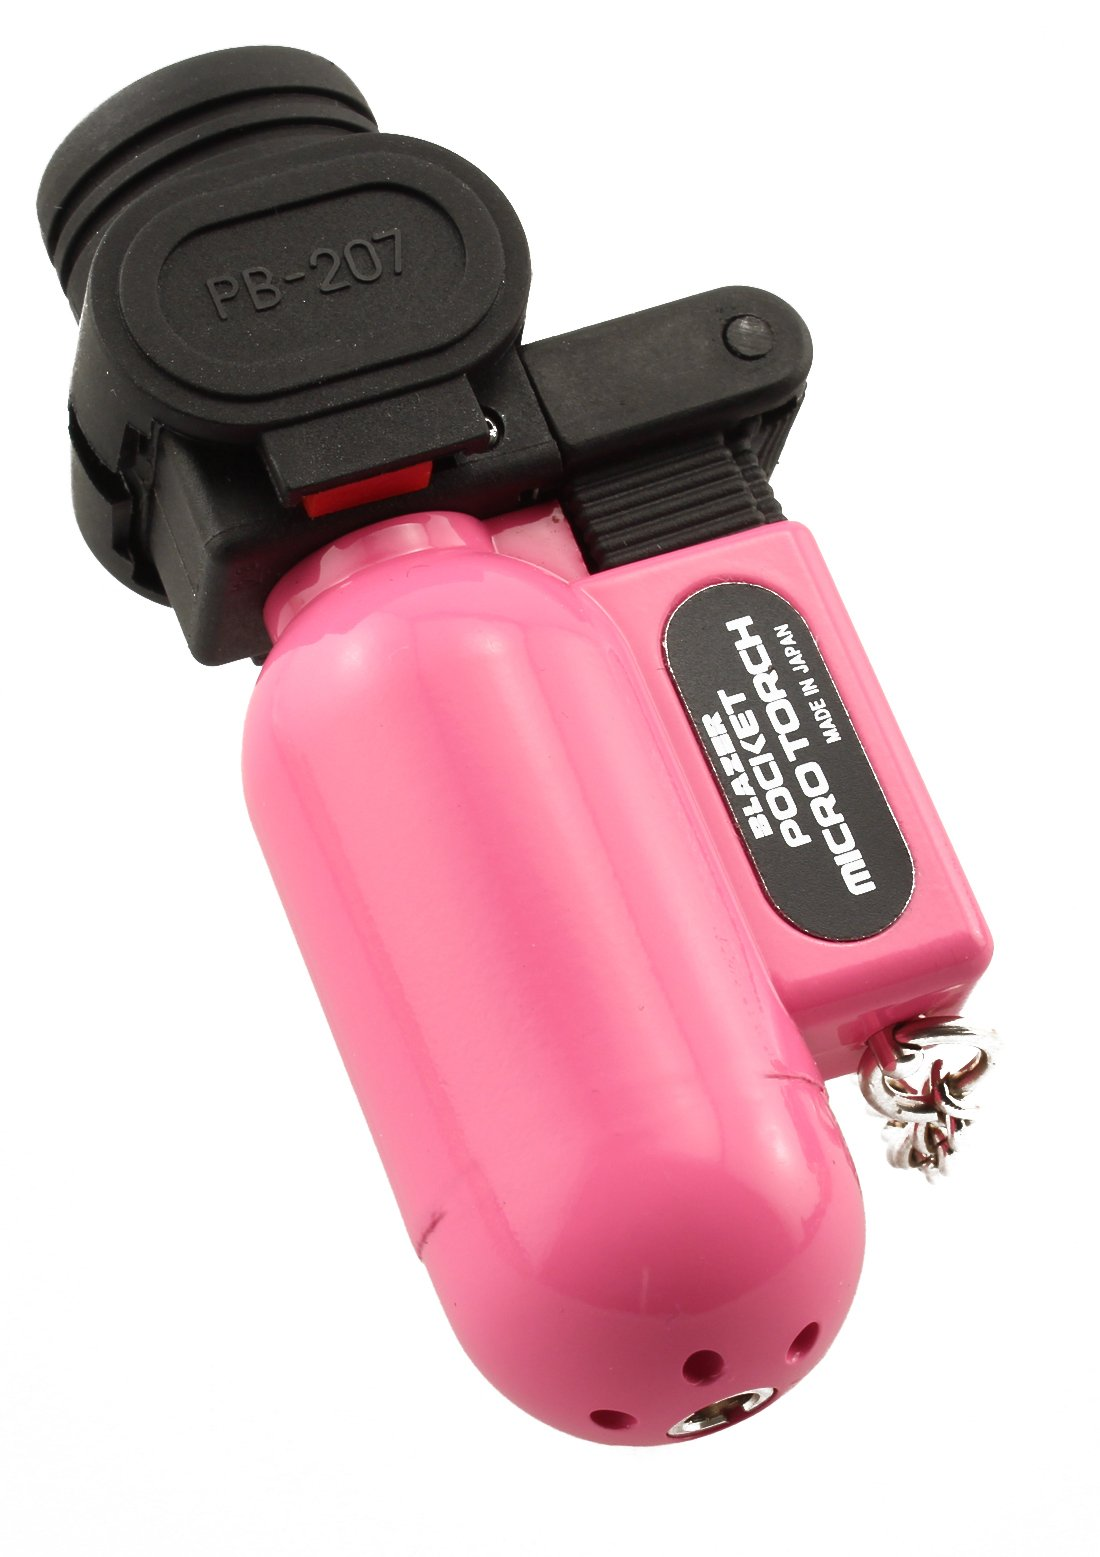 Blazer PB207CR The Torch Butane Refillable Lighter, Pink